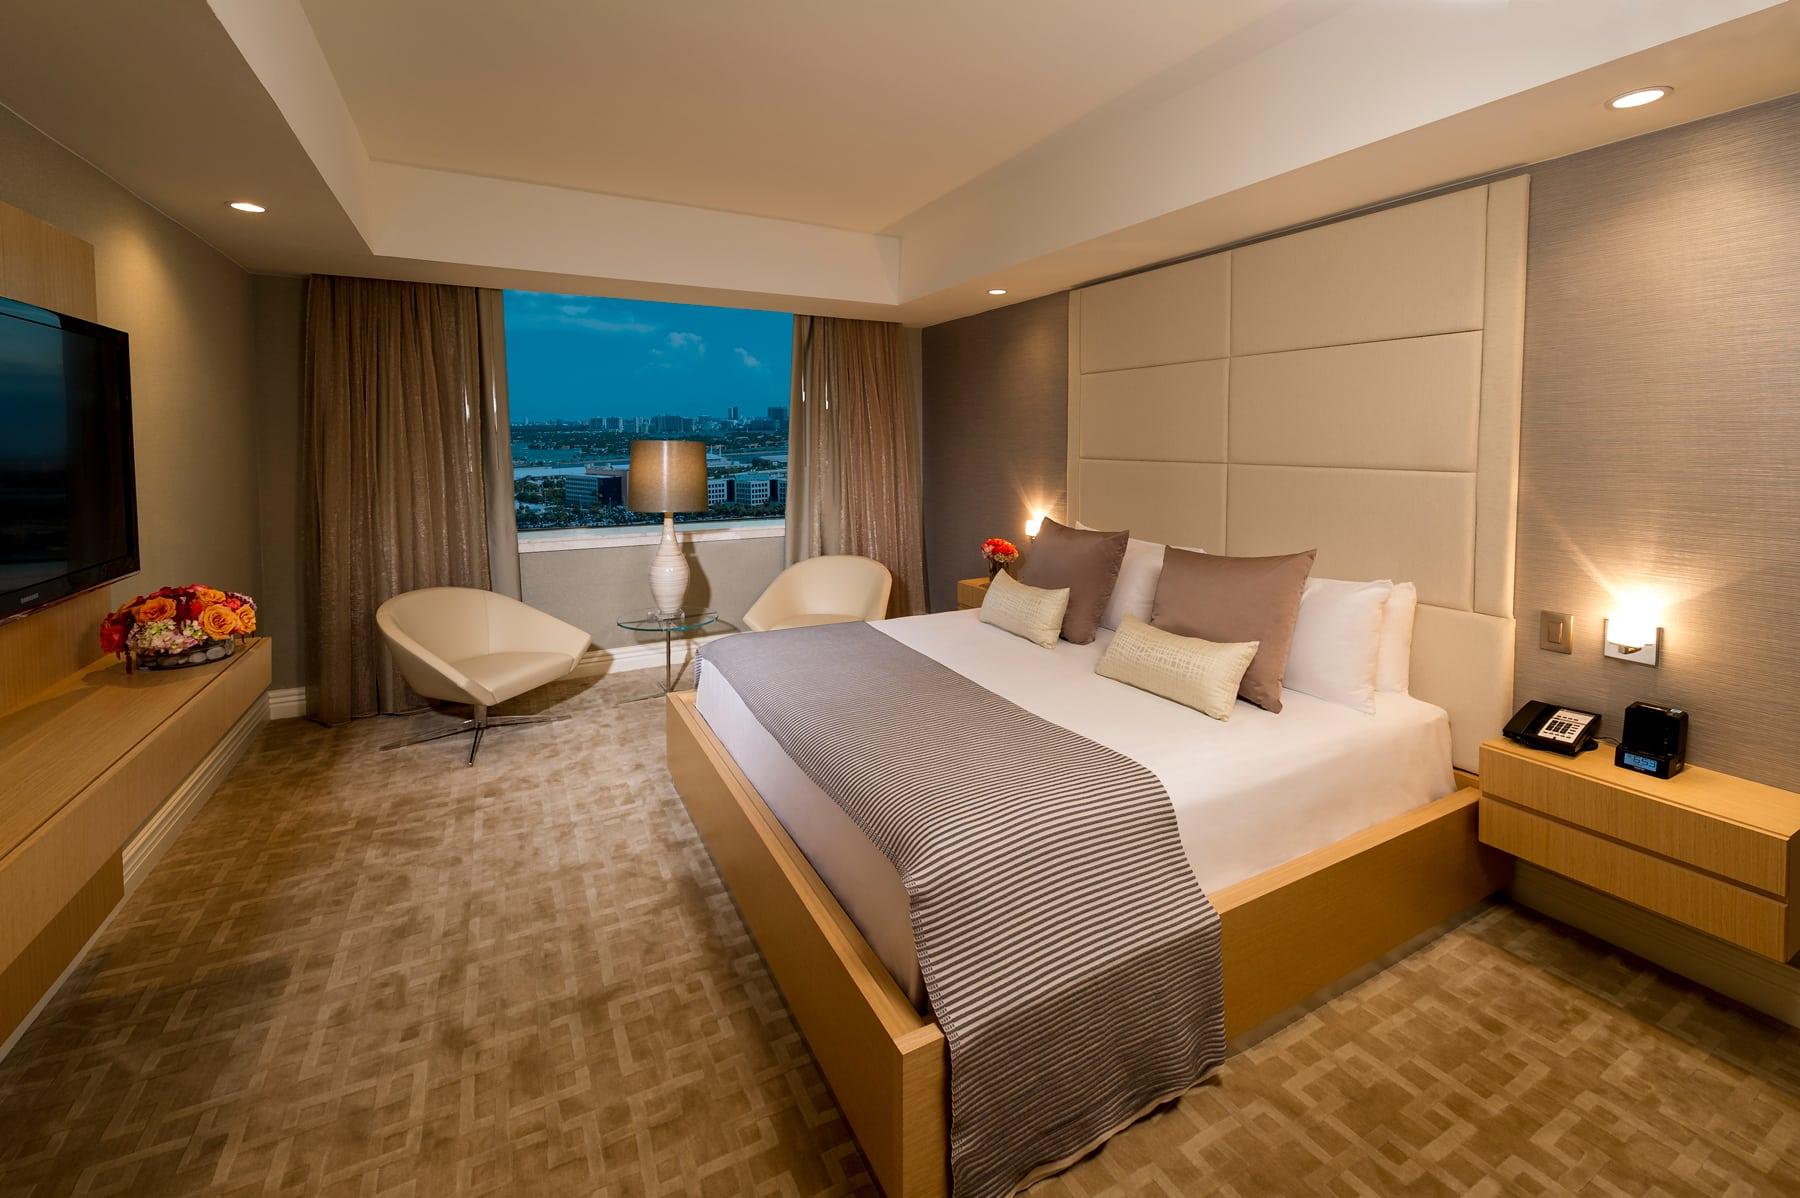 Intercontinental Hotel   Room 3   Miami, FL   Hospitality   Interior Designers